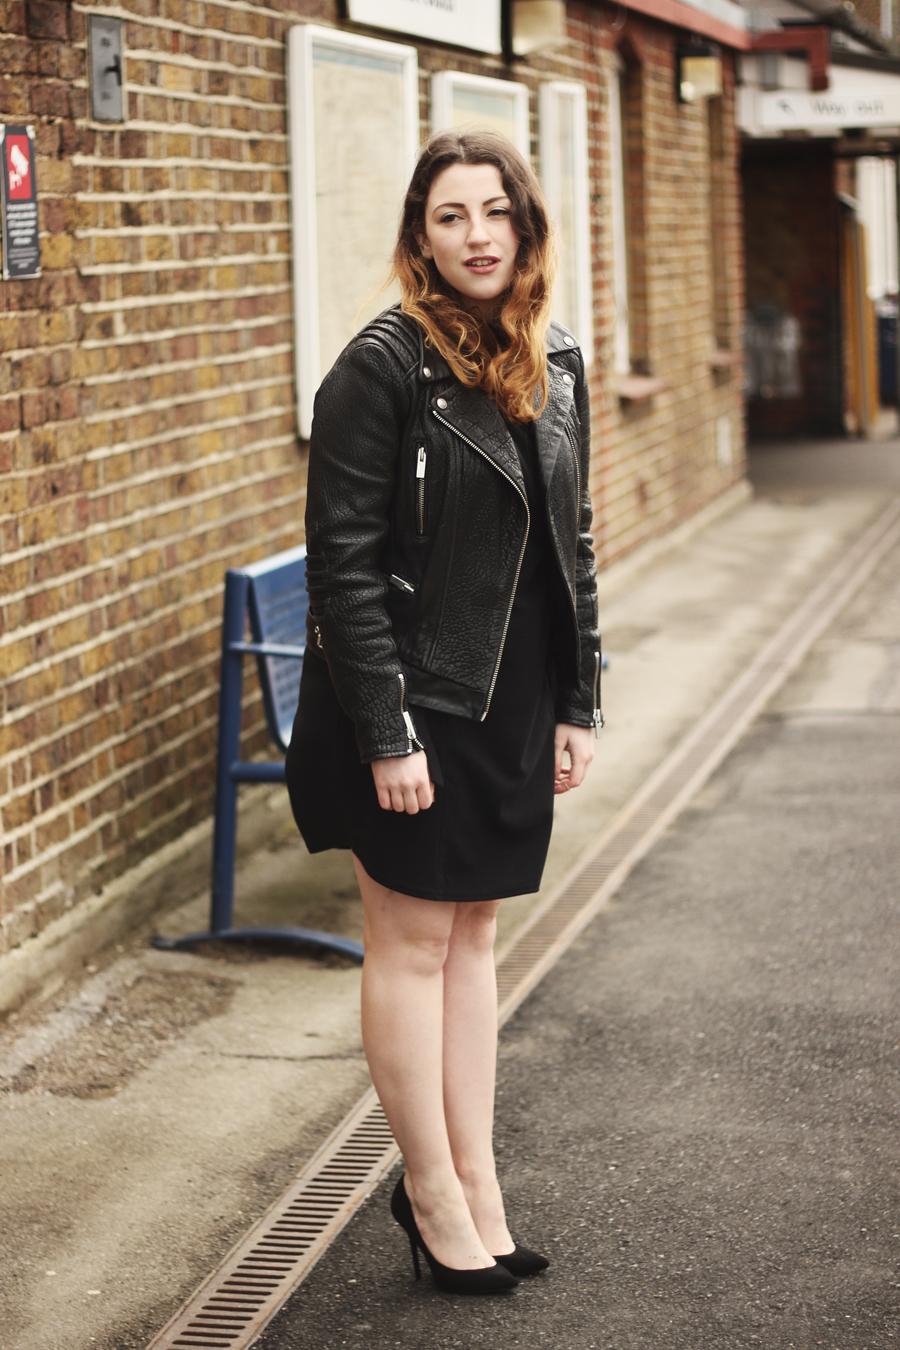 Leather jacket boohoo - Asymmetric Heels C O Boohoo Midi Ring Set Worn On My Actual Fingers As I Have Child Hands C O Boohoo The Kooples Leather Jacket